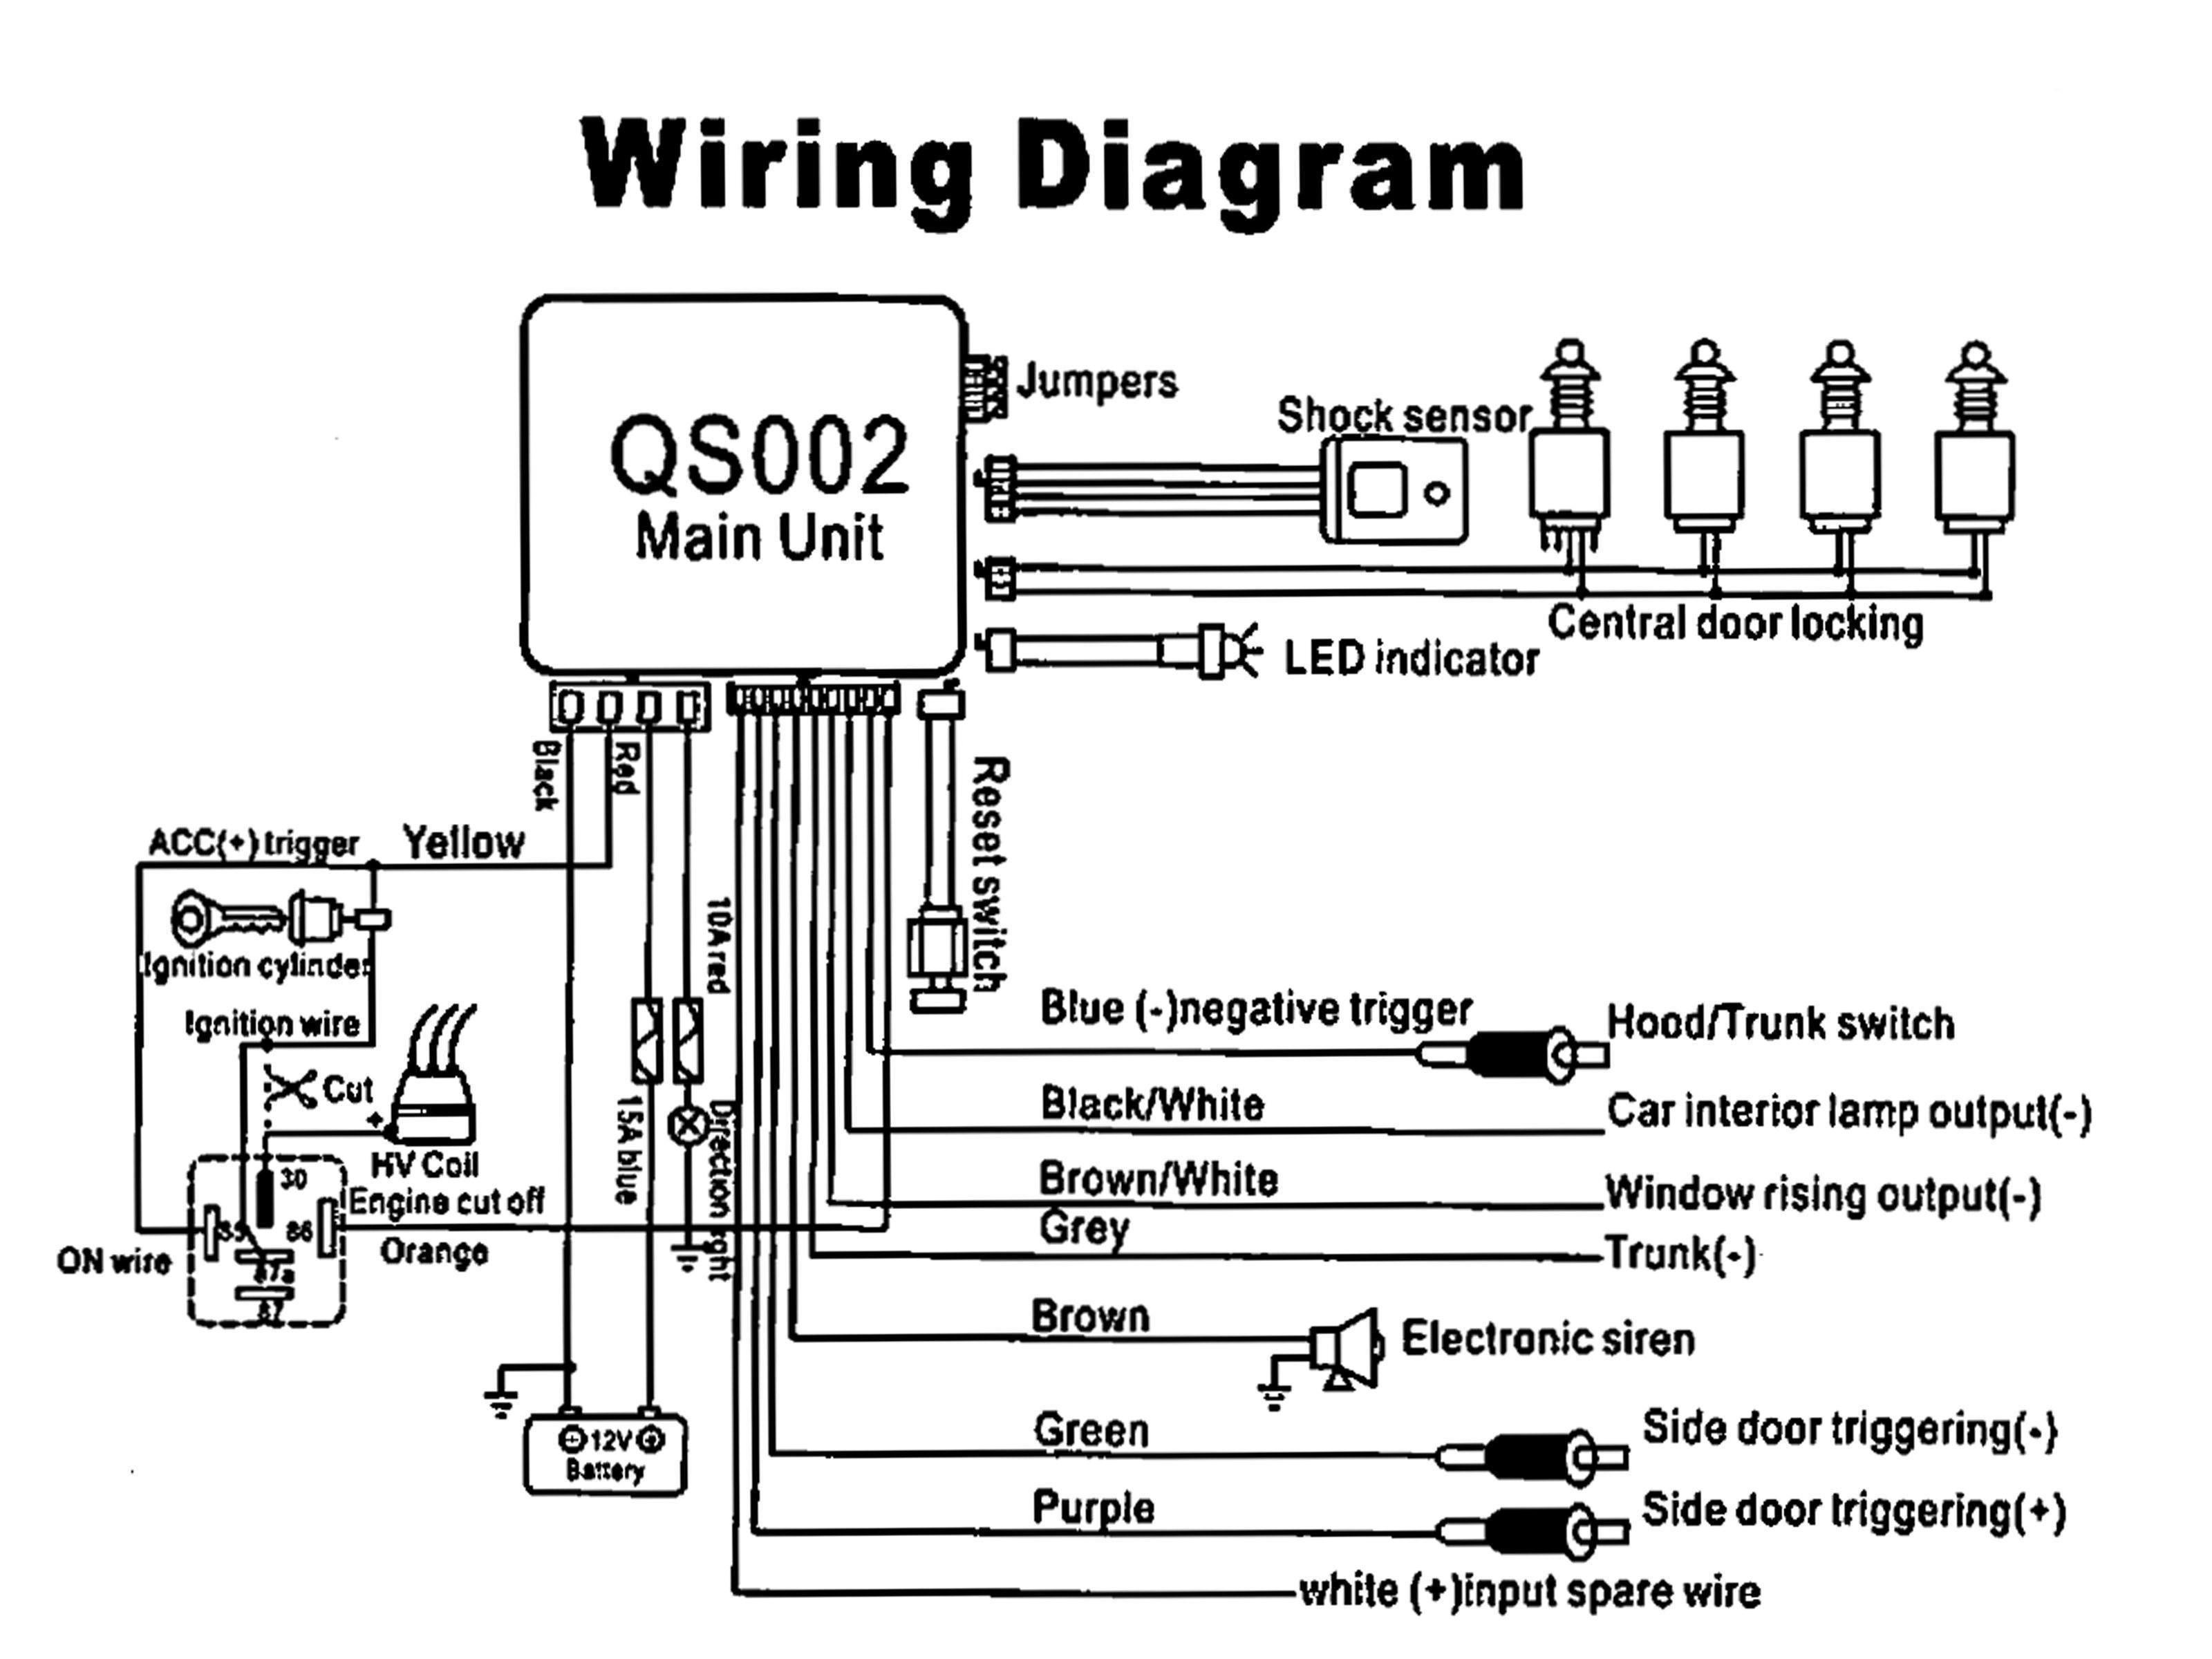 [WLLP_2054]   XL_5219] Number 1014 Century Battery Charger Wiring Diagram Schematic Wiring | Scytek Car Wiring Diagram |  | Mill Ultr Mohammedshrine Librar Wiring 101